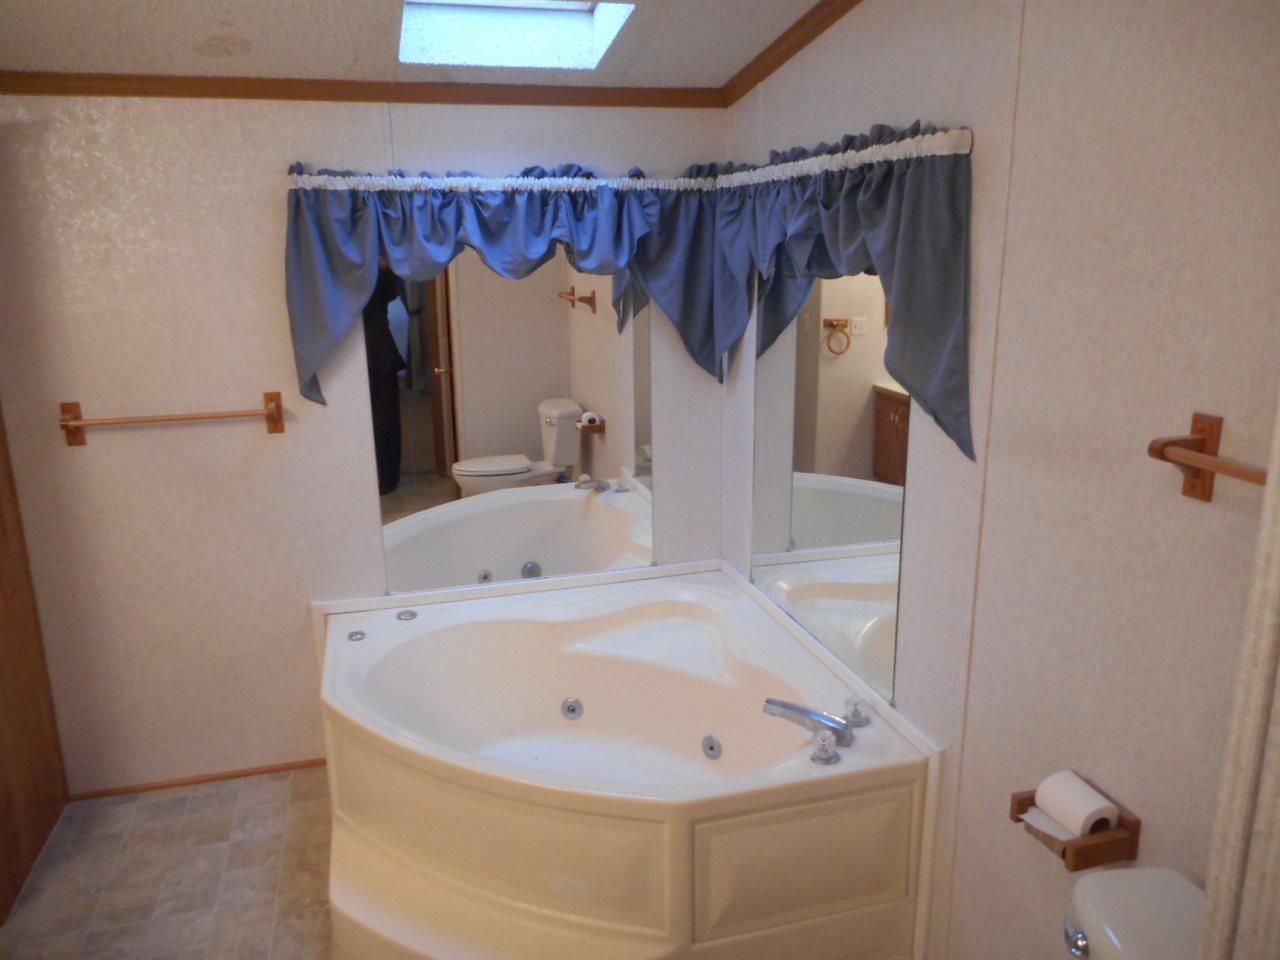 Bathroom Fixtures Janesville Wi 1422 alden rd, janesville, wi 53545 mls# 1791149 - movoto